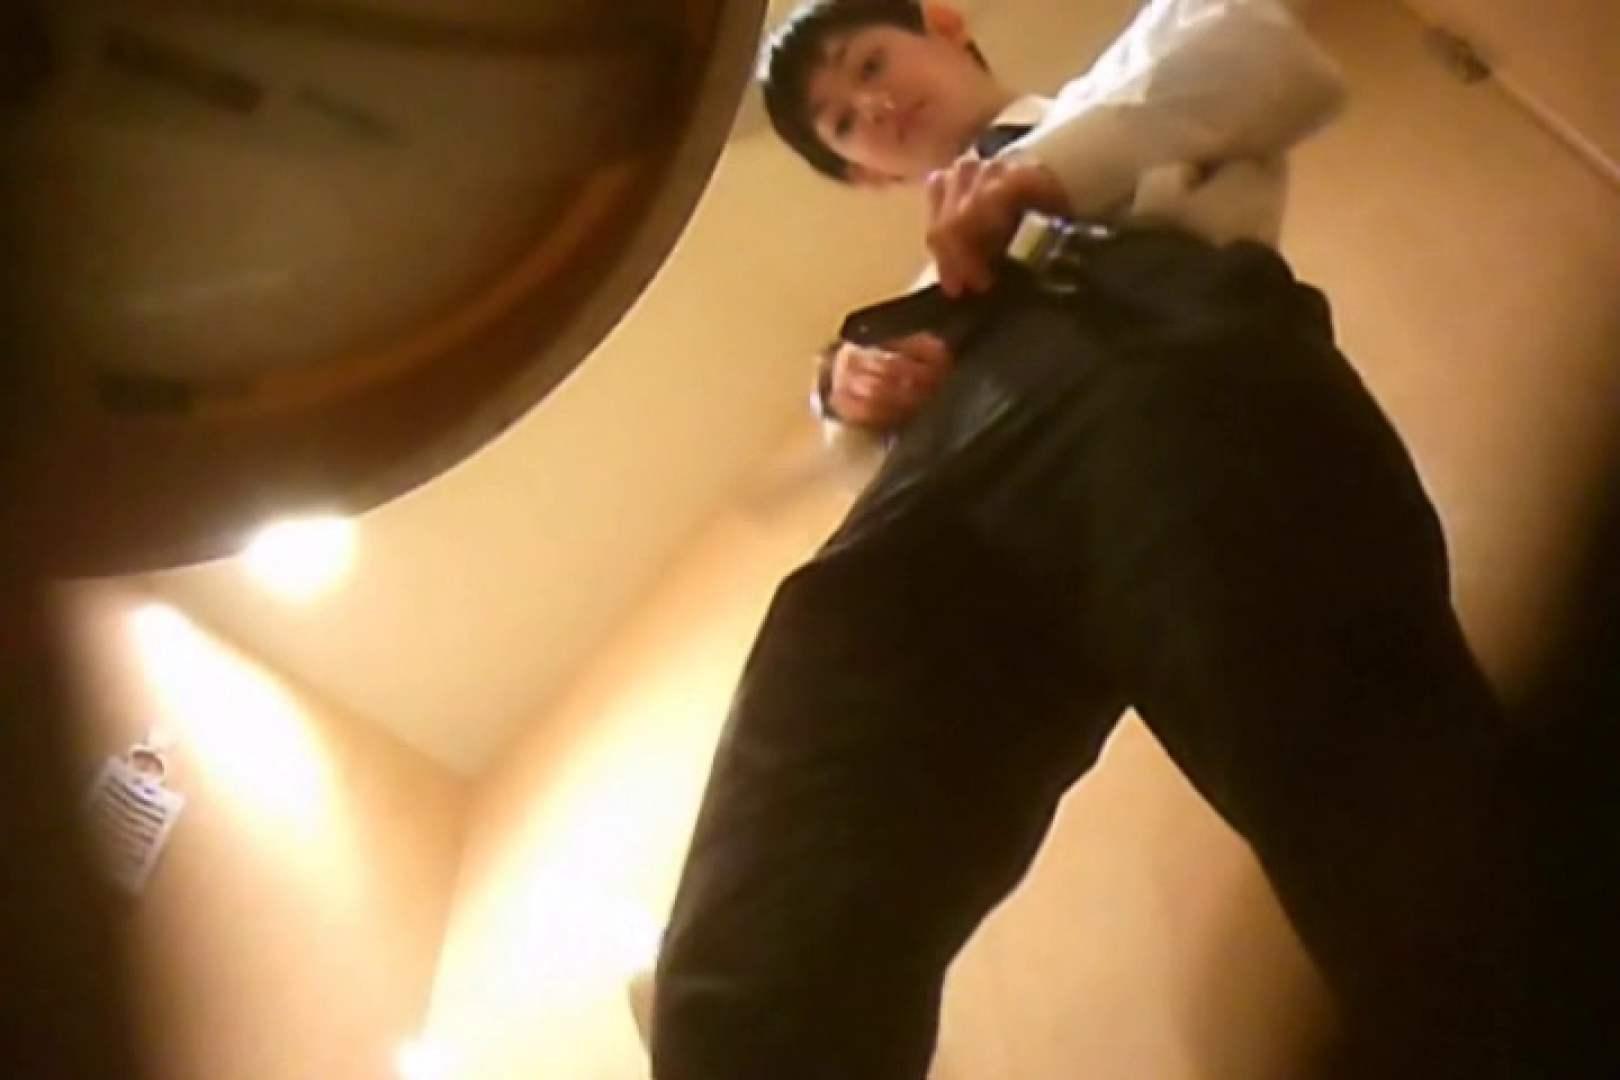 SEASON 3rd!掴み取りさんの洗面所覗き!in新幹線!VOL.06 スーツボーイズ | のぞき  74pic 19